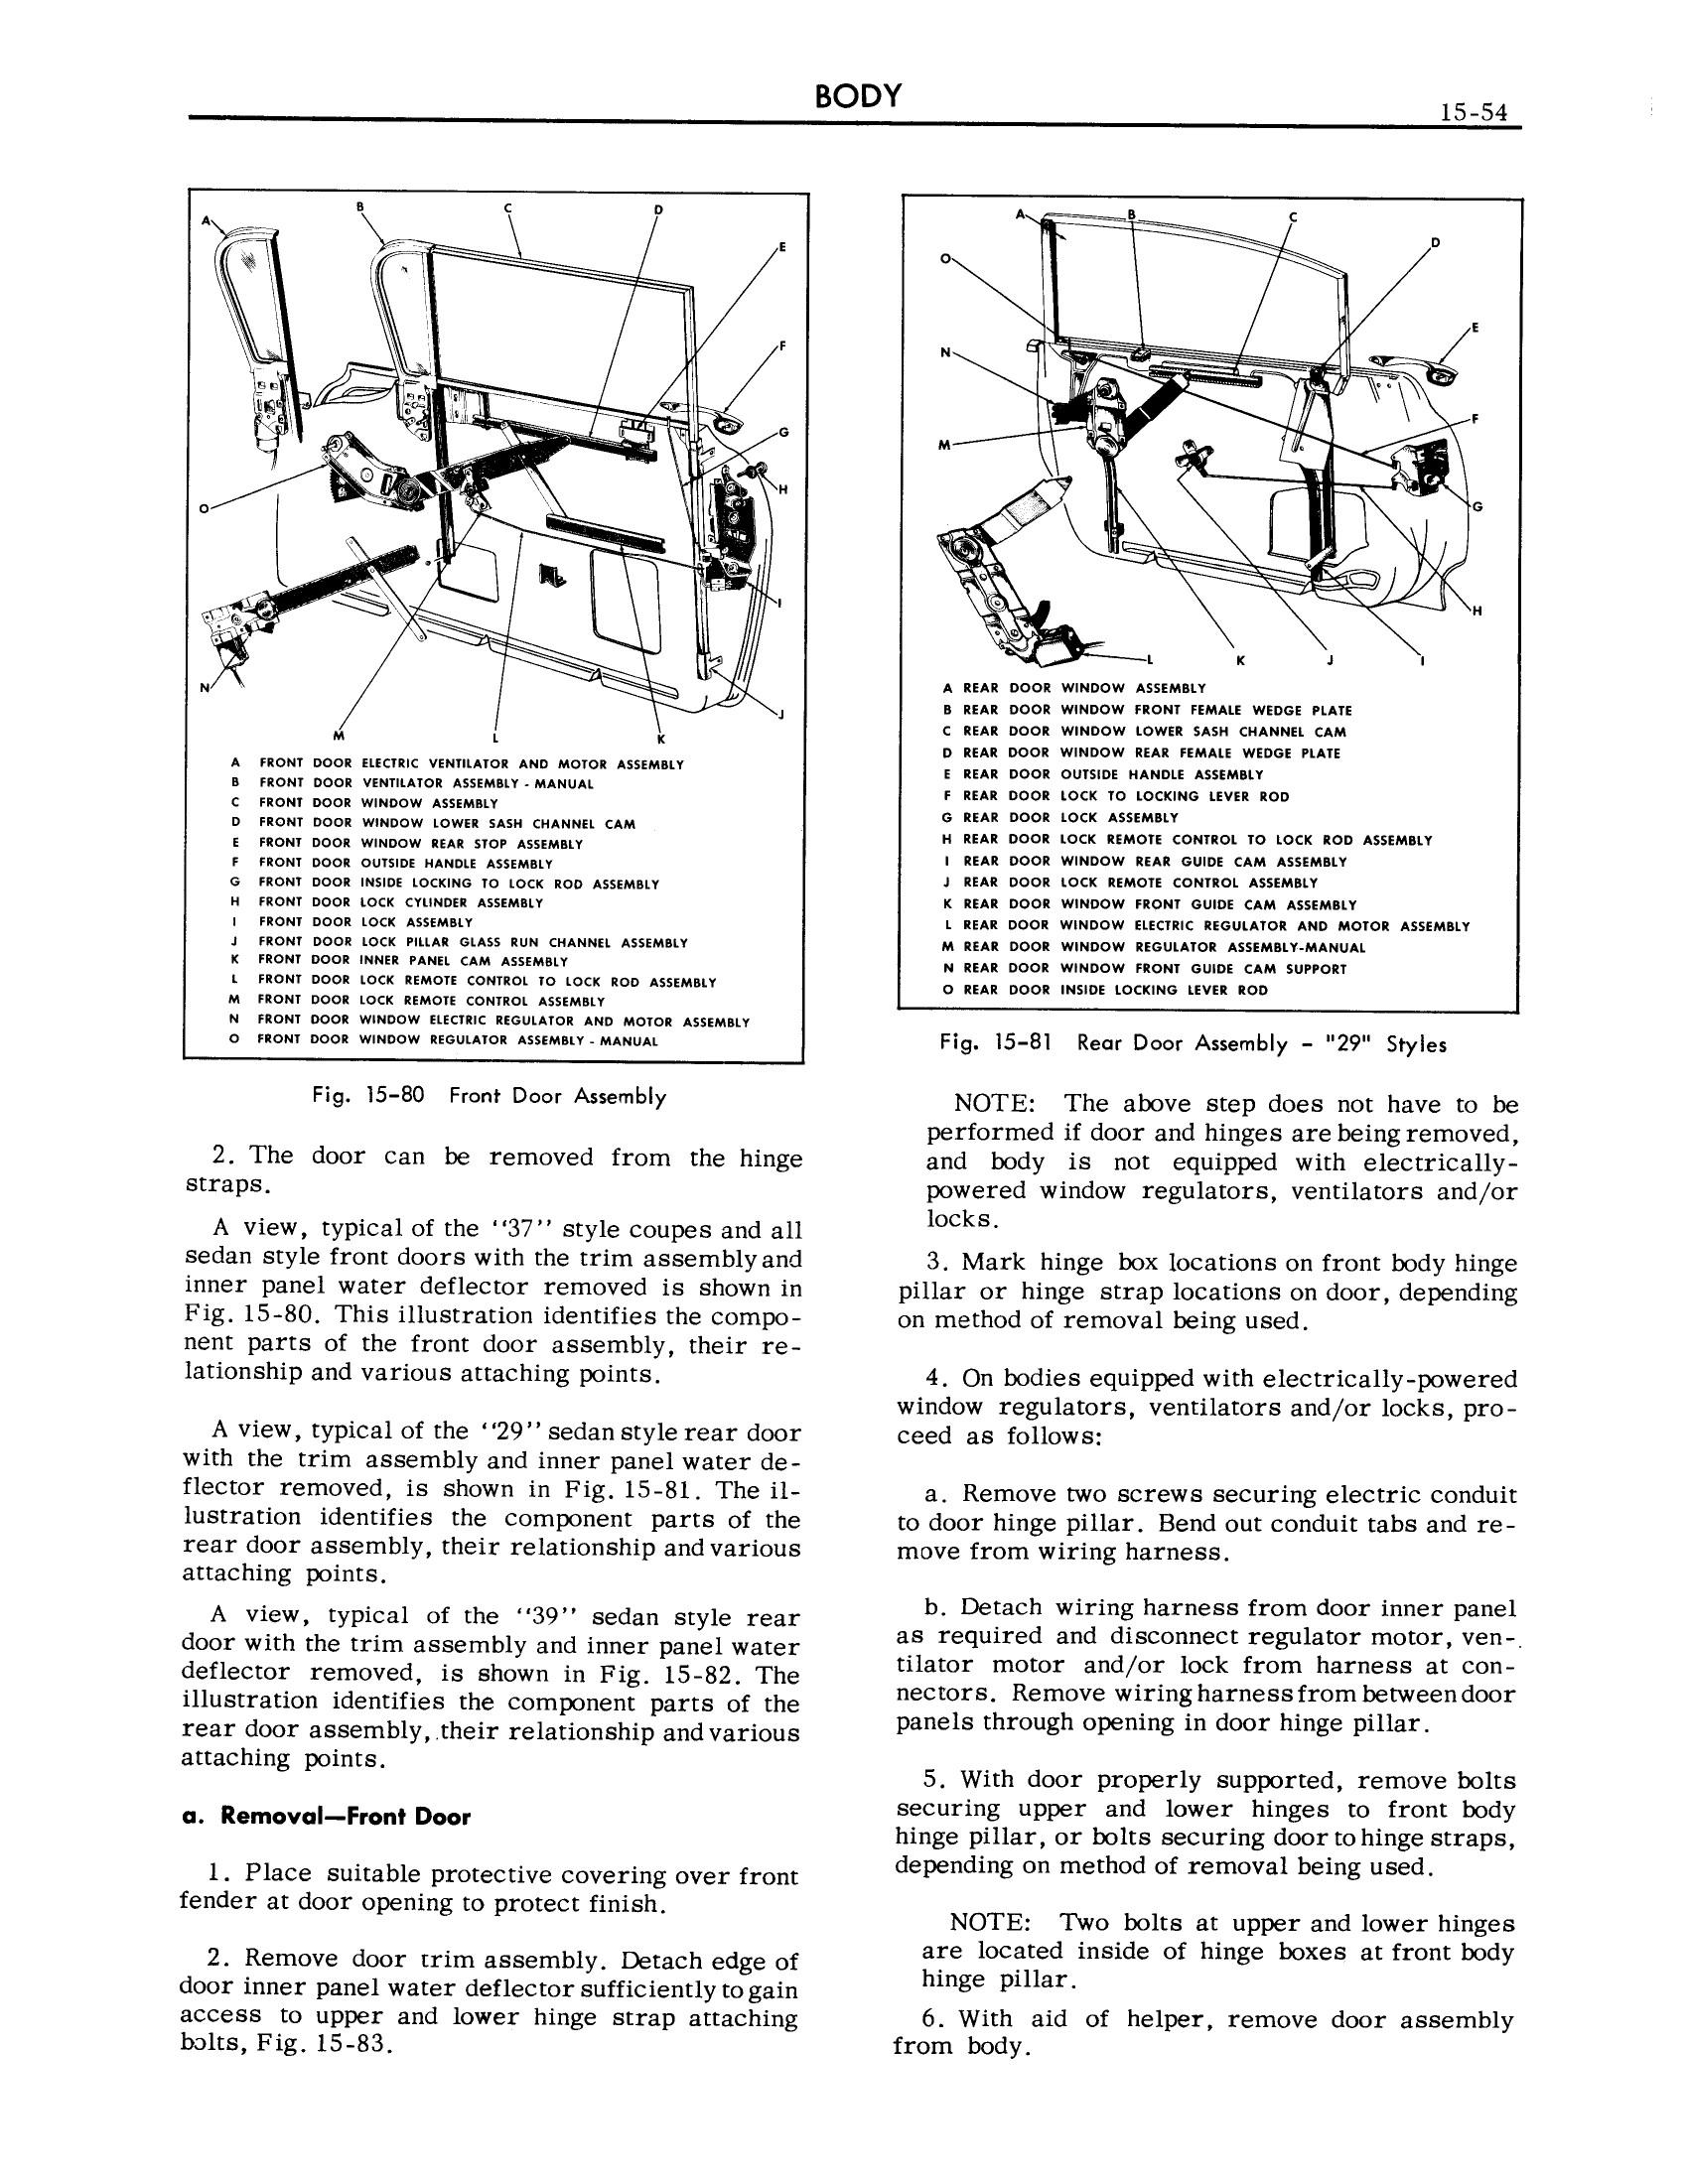 1959 Cadillac Shop Manual- Body Page 54 of 99